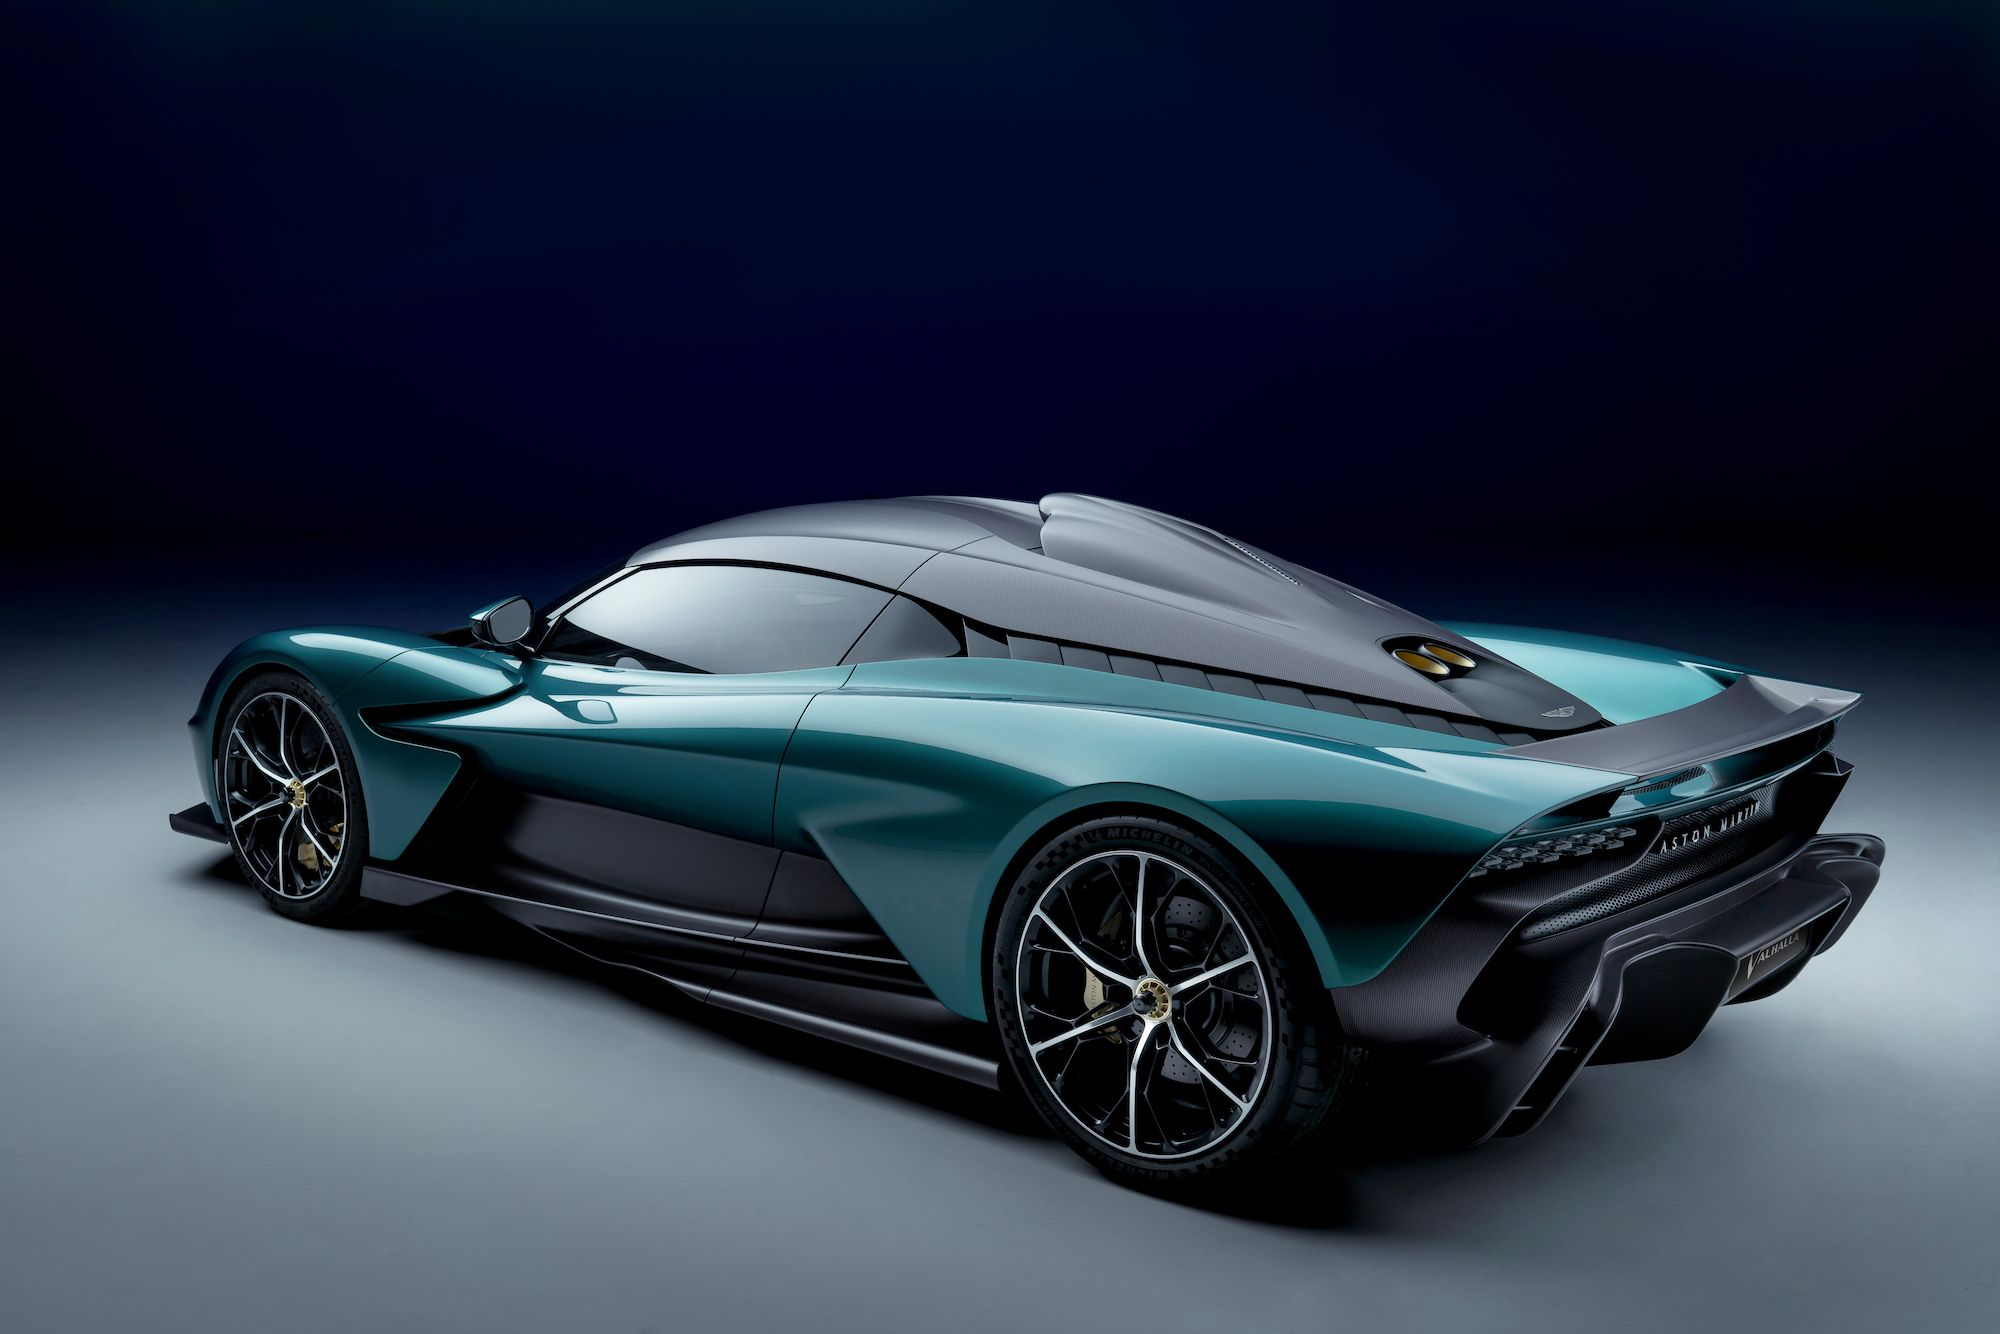 Aston_Martin_Valhalla03.jpg